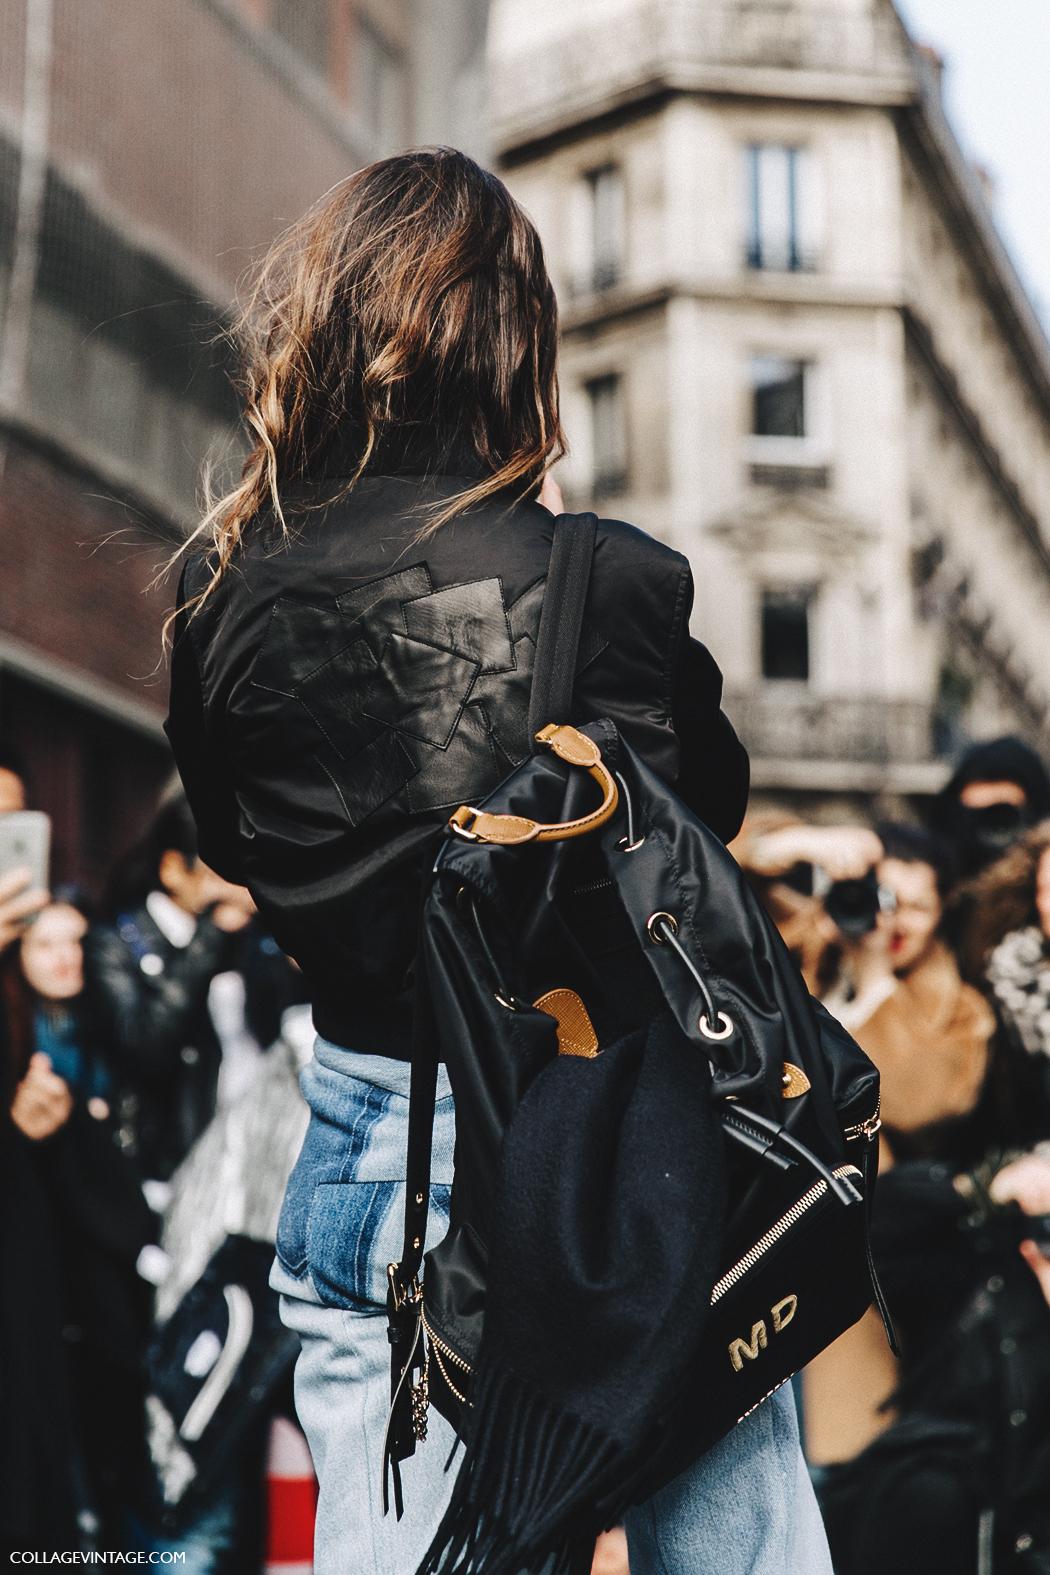 PFW-Paris_Fashion_Week_Fall_2016-Street_Style-Collage_Vintage-Miroslava_Duma-Vetements-Jeans-Backpack-Bomber-4